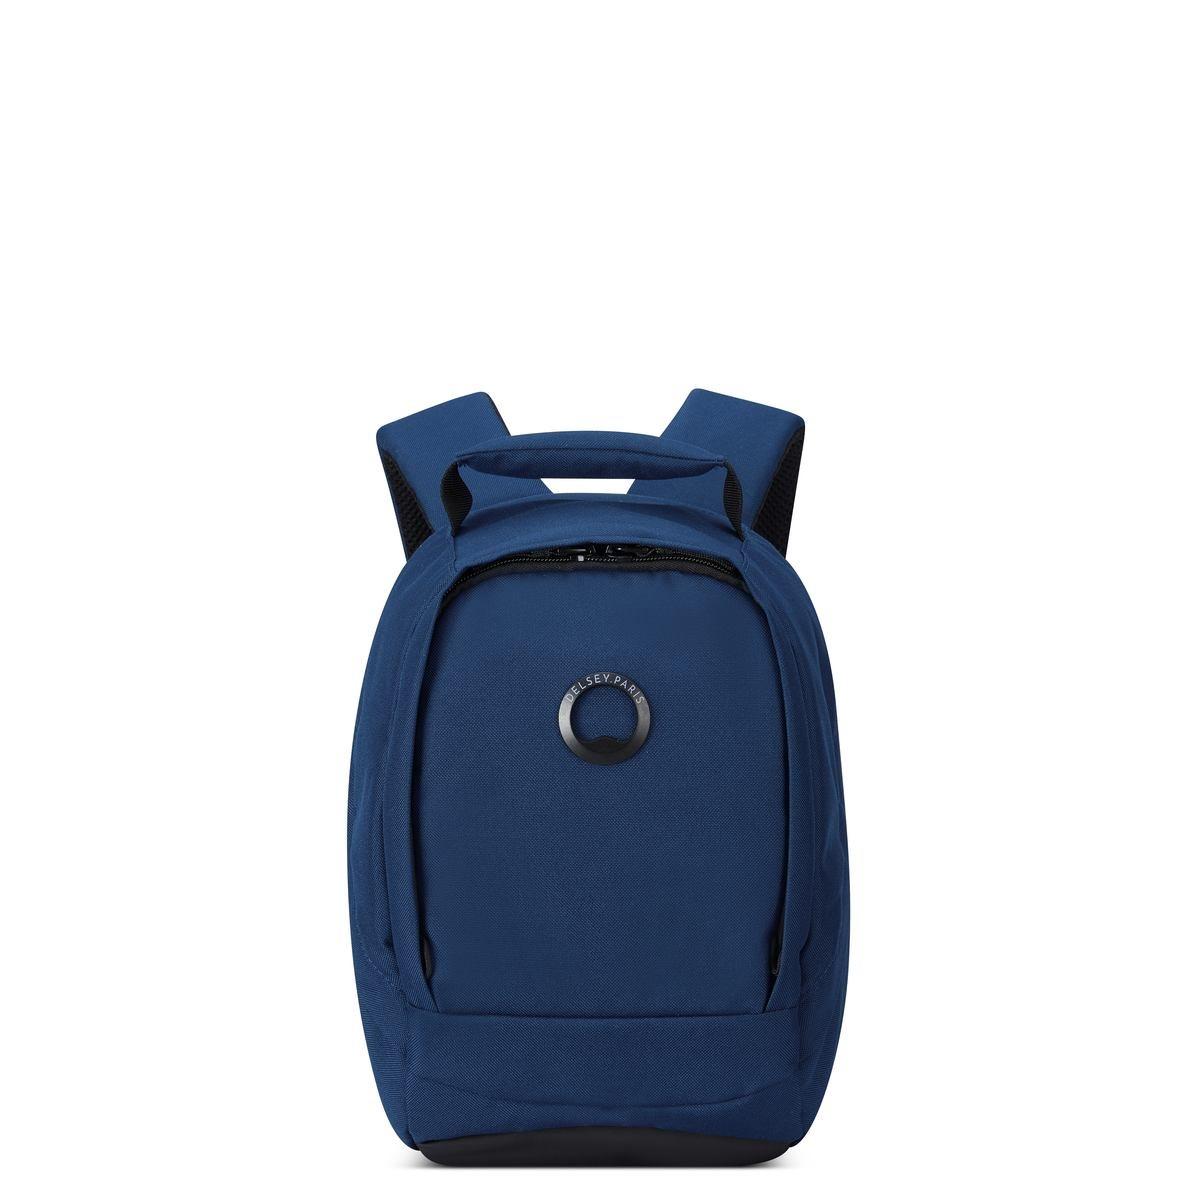 Delsey σακίδιο πλάτης 30.5x21.5x14.5cm Securban Micro Dark Blue